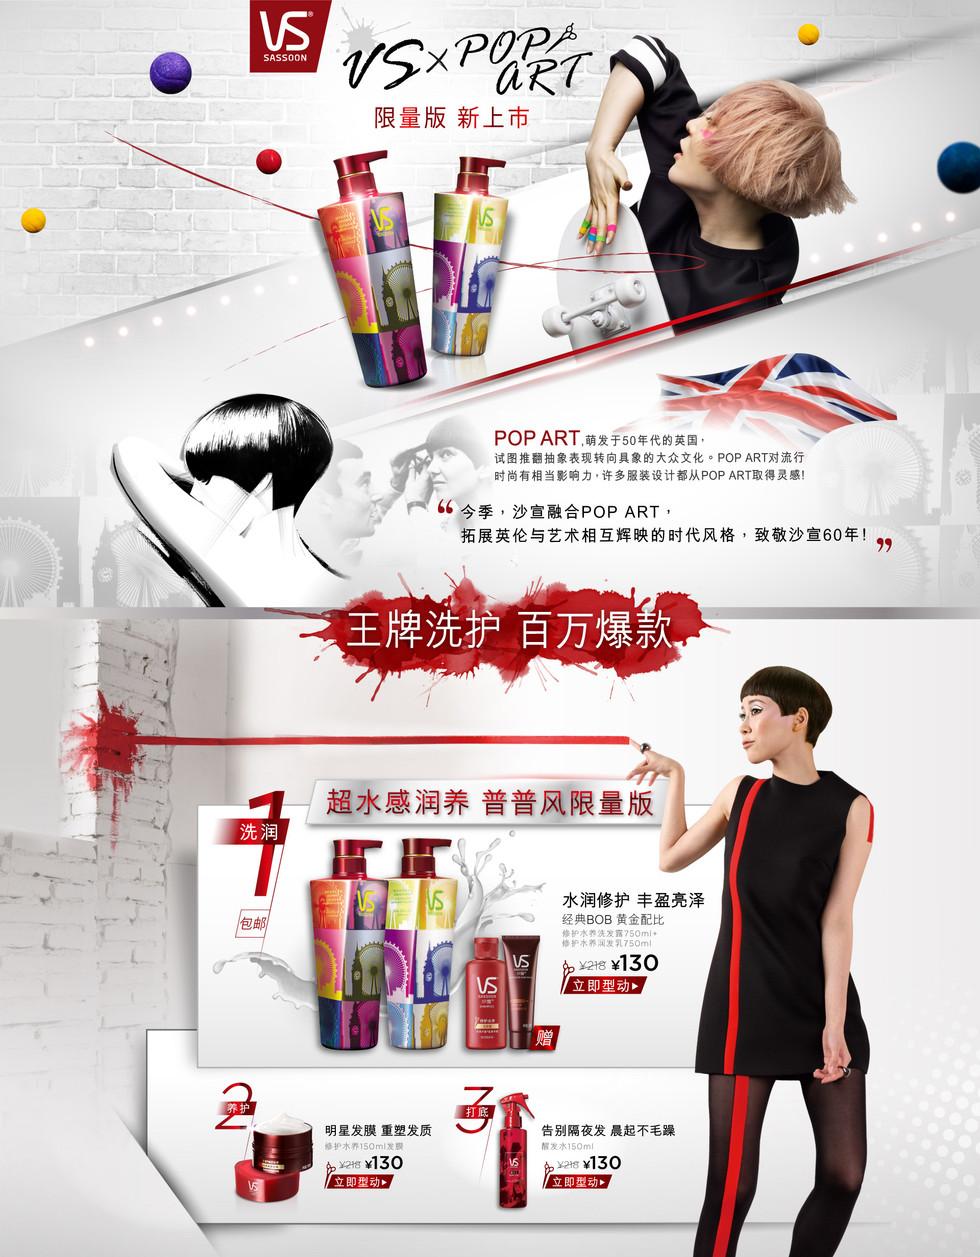 VS-T-mall-Campaign-page-1.jpg